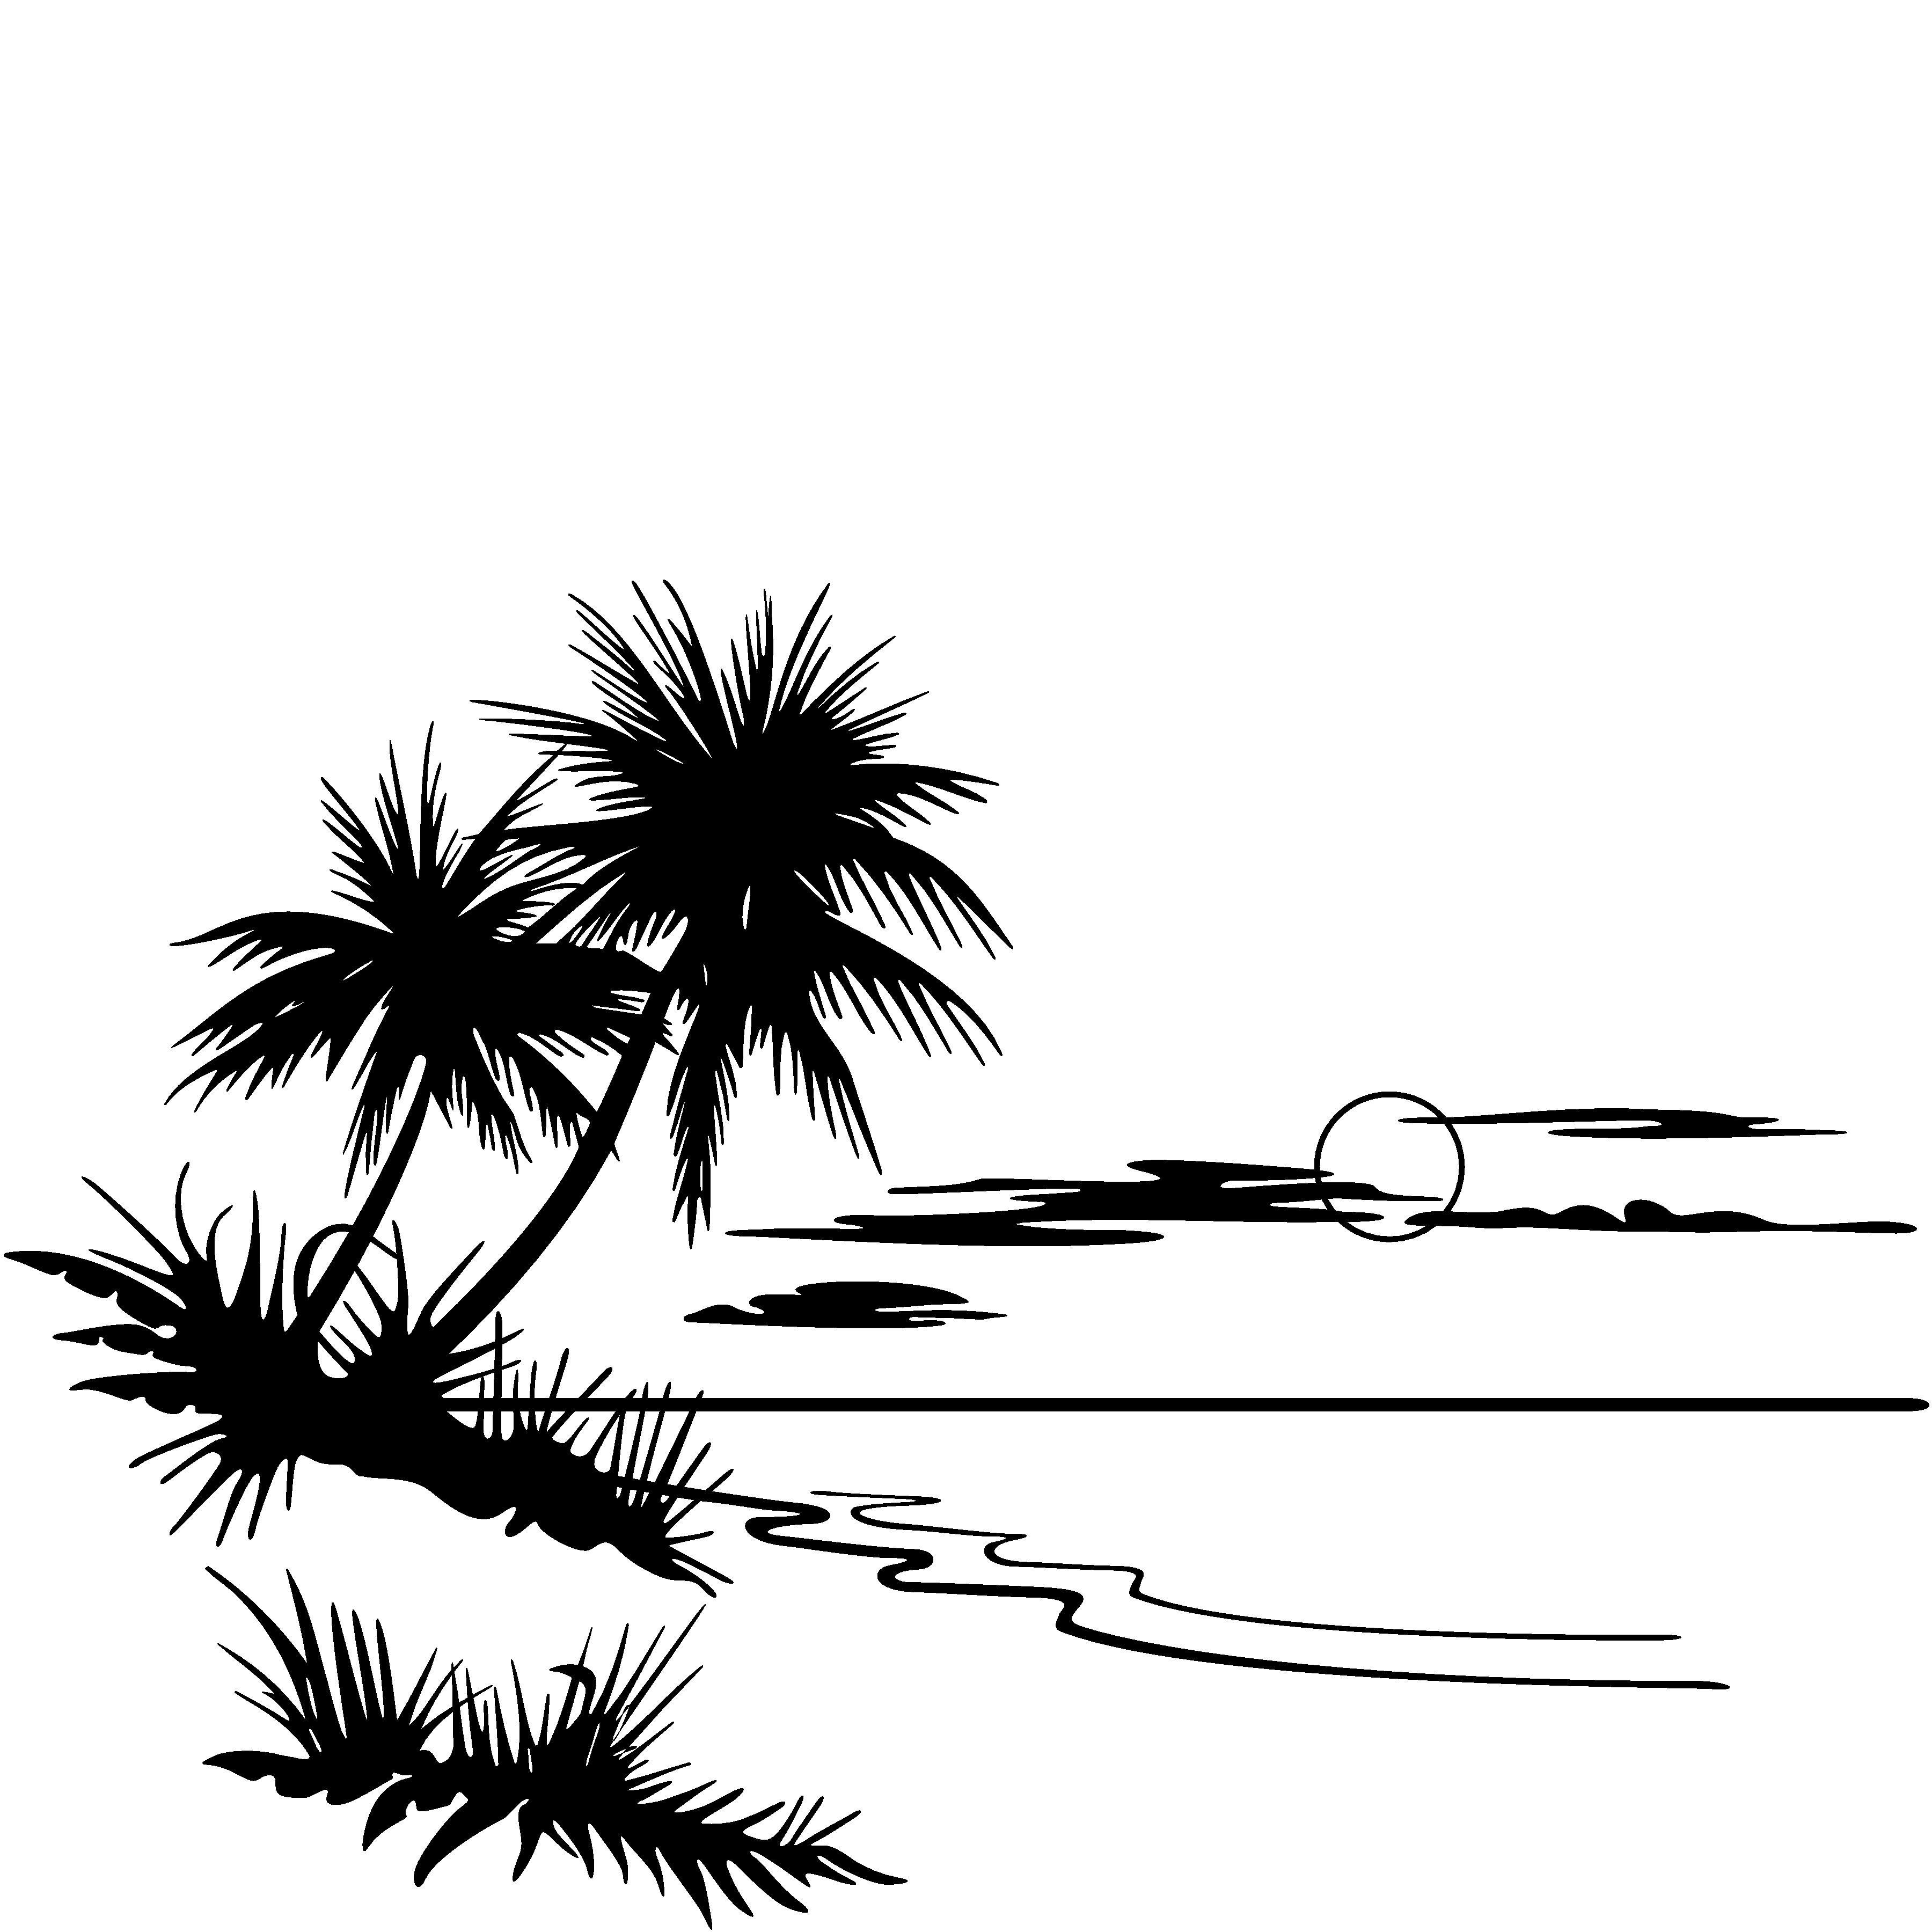 Panda free images palmtreebeachsunset. Beach clipart black and white